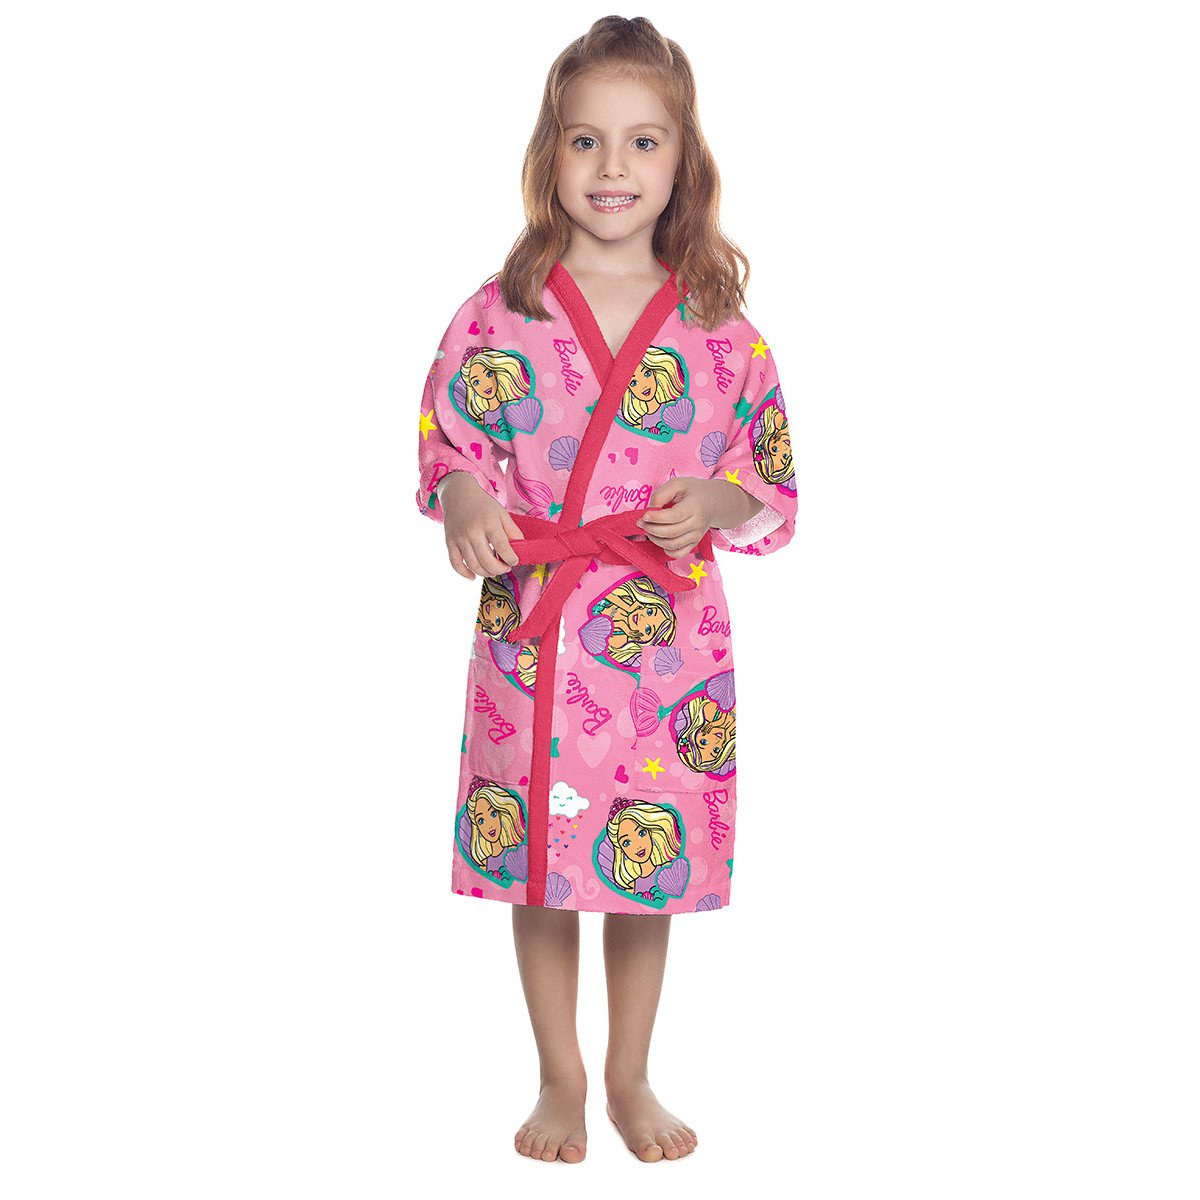 Roupao infantil aveludado g Barbie 73208